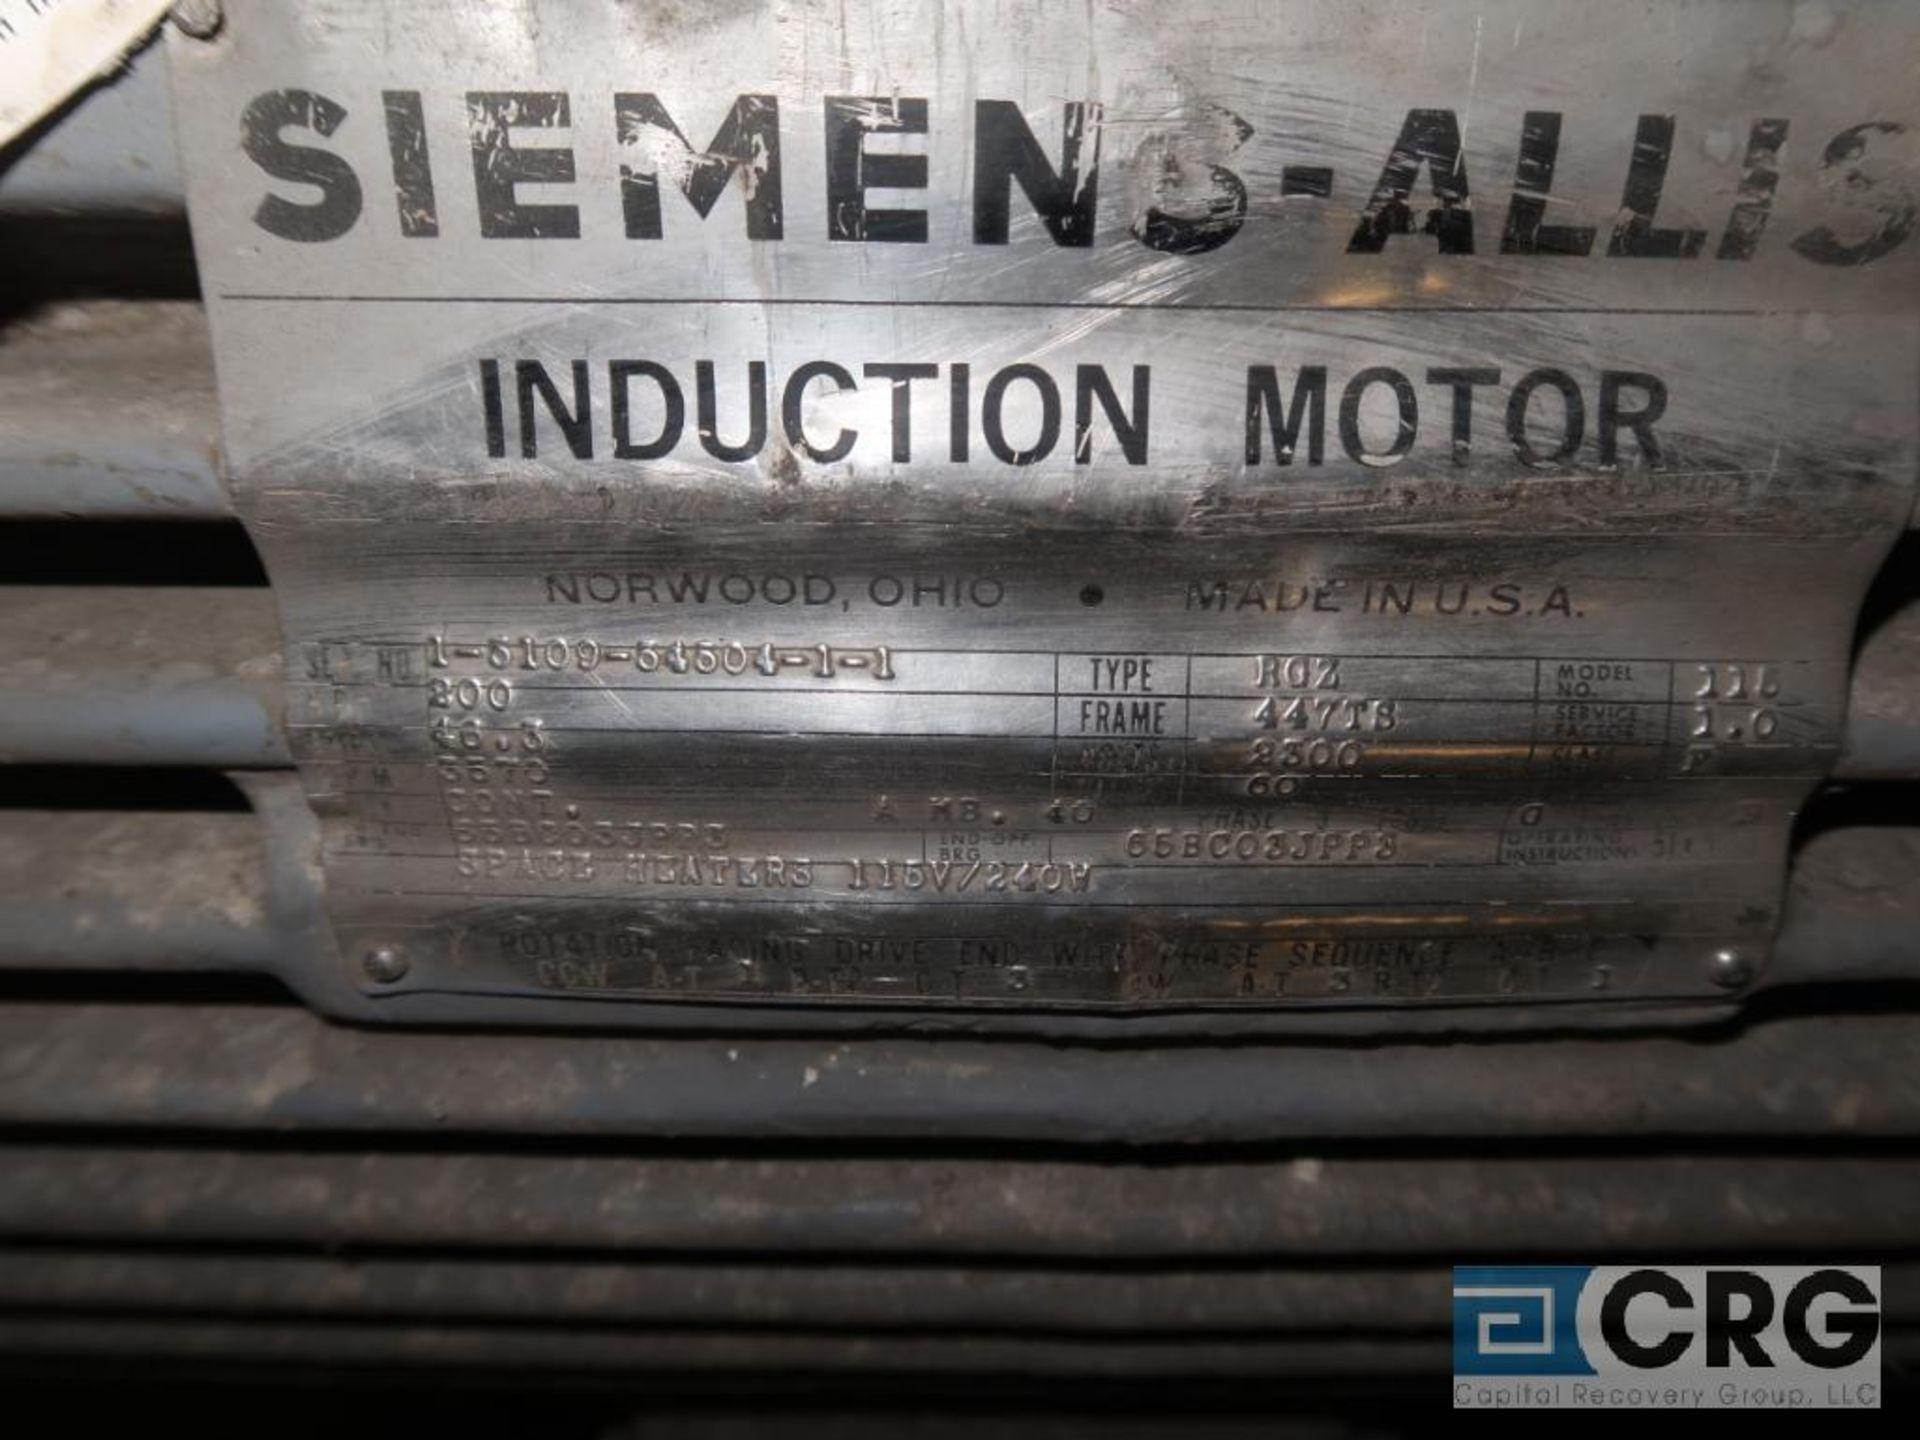 Siemens-Allis induction motor, 200 HP, 3,570 RPMs, 2,300 volt, 3 ph., 447TS frame (Finish Building) - Image 2 of 2